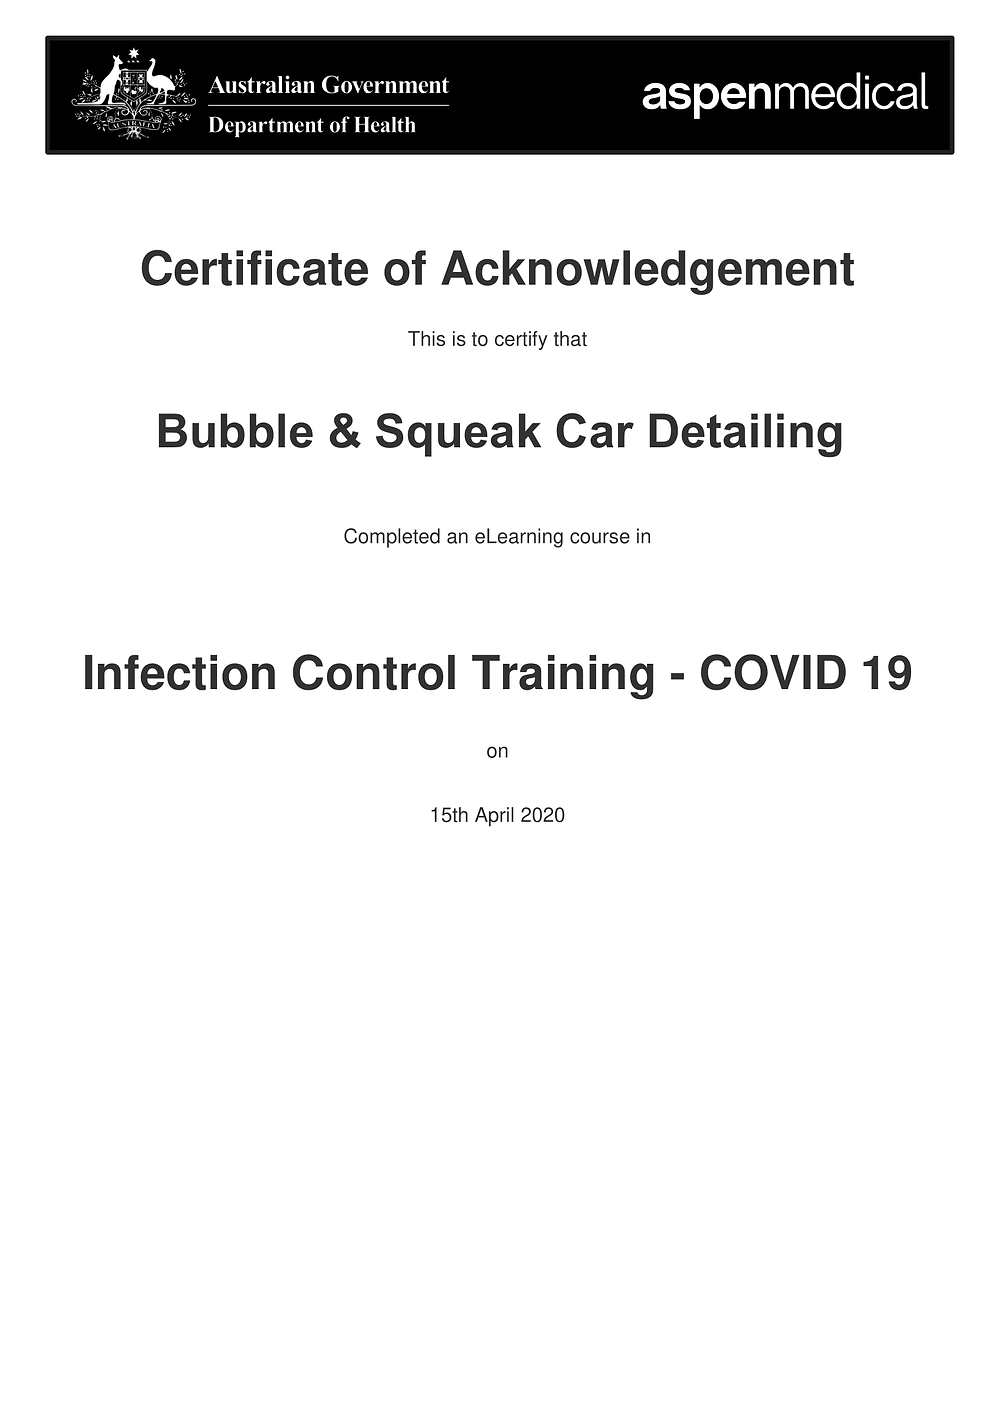 Mobile Car Detailing COVID-19 Certificate